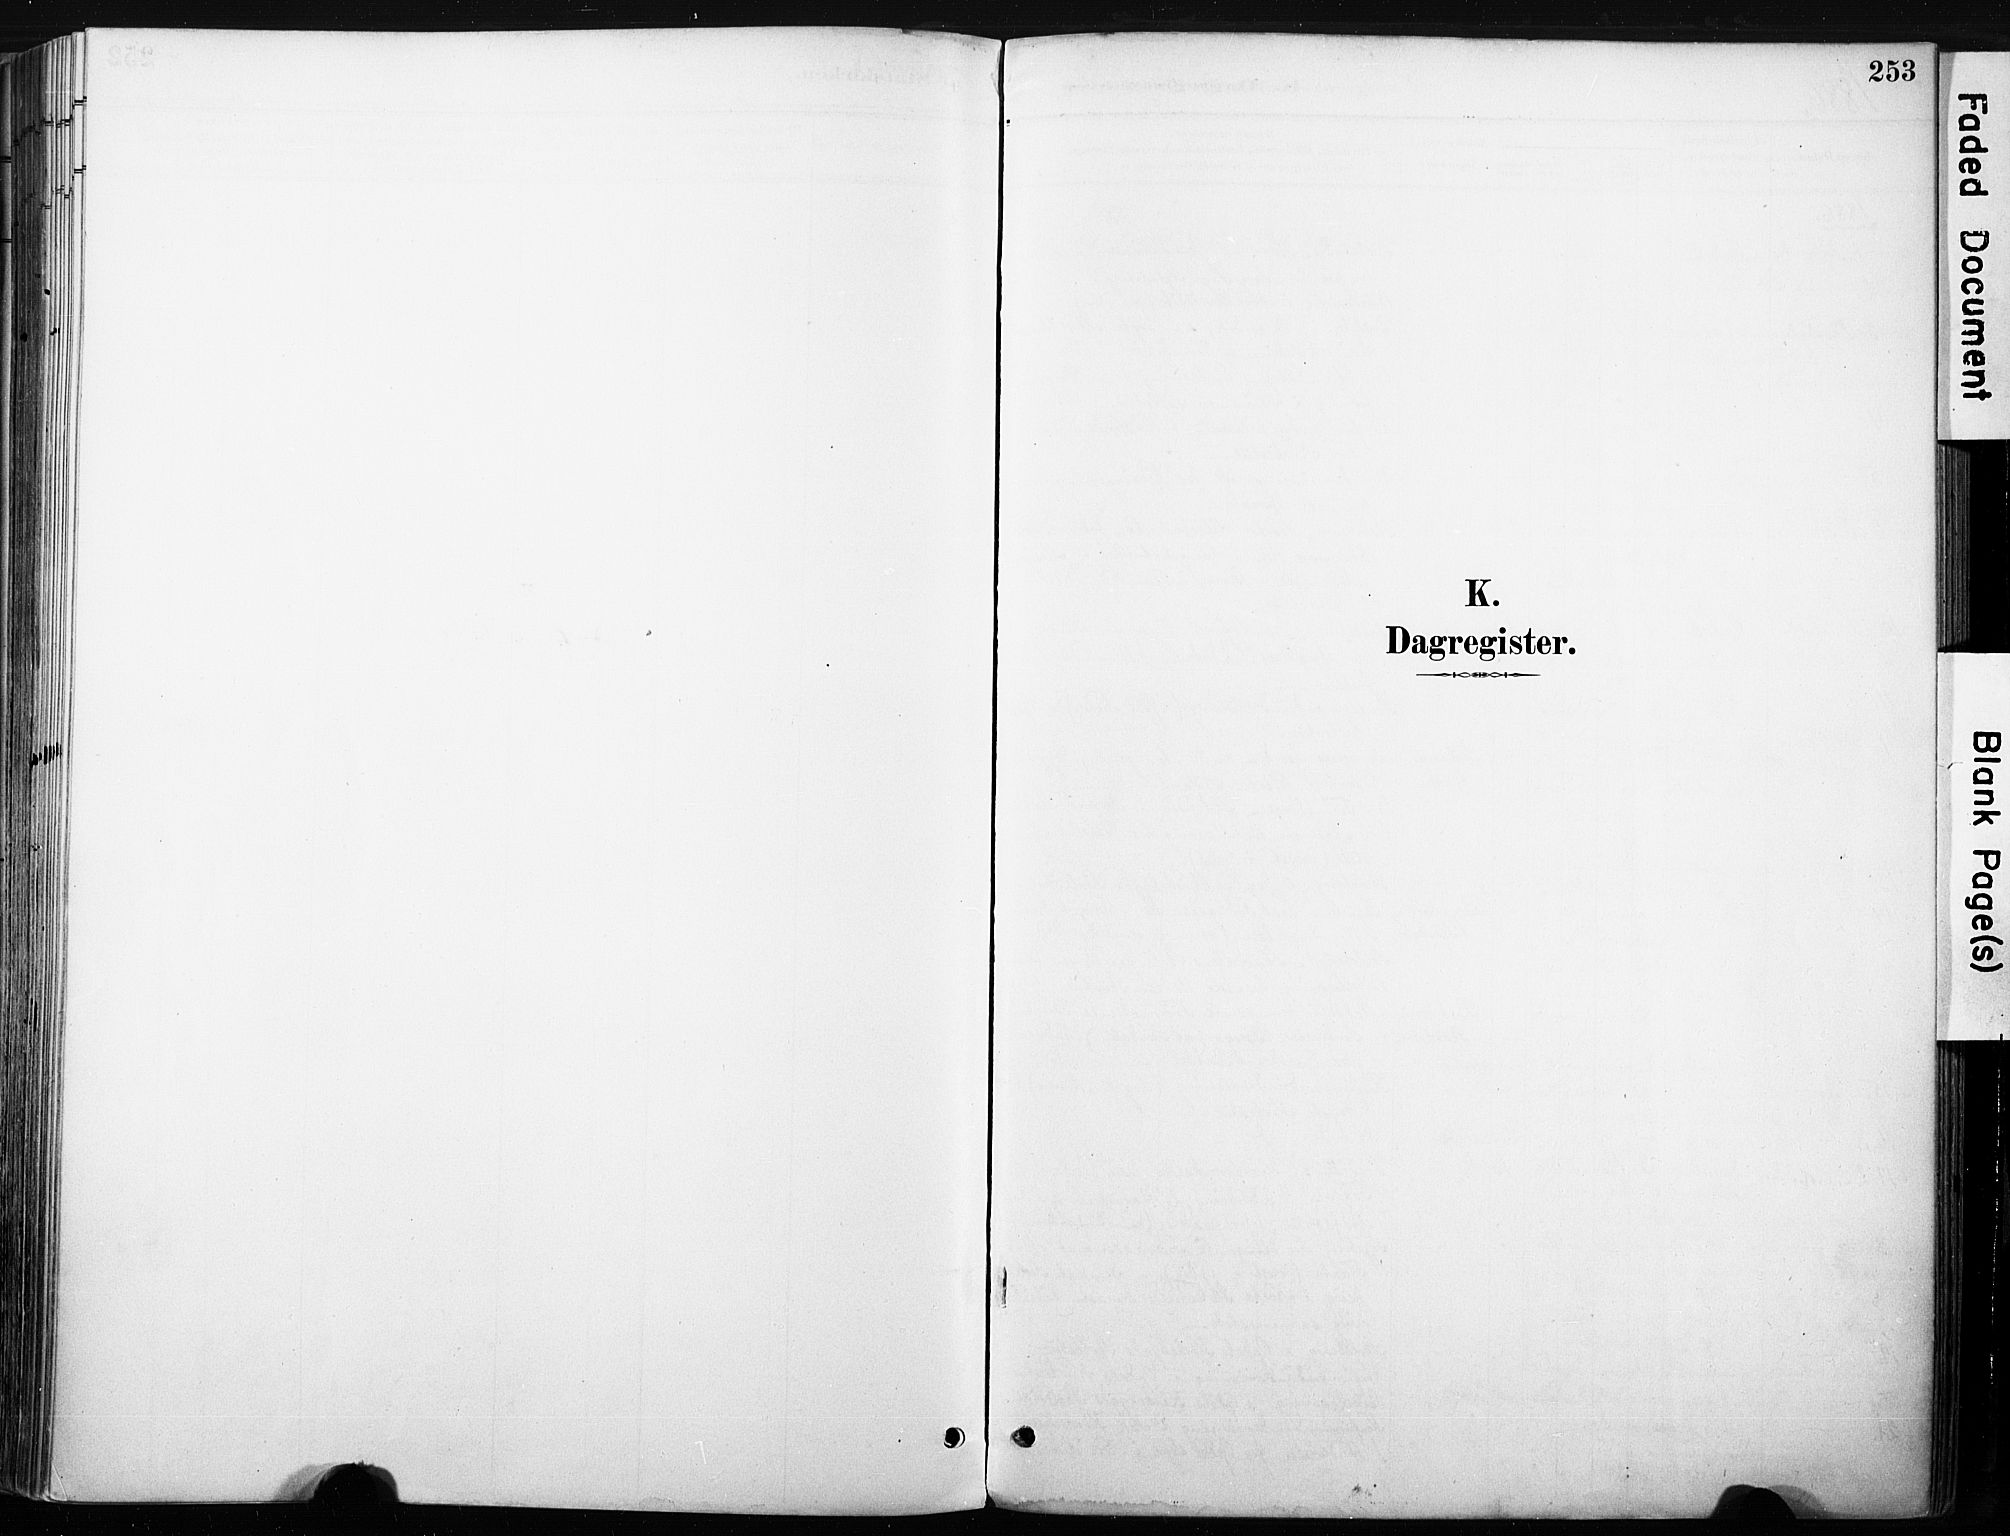 SAKO, Nore kirkebøker, F/Fb/L0002: Ministerialbok nr. II 2, 1886-1906, s. 253